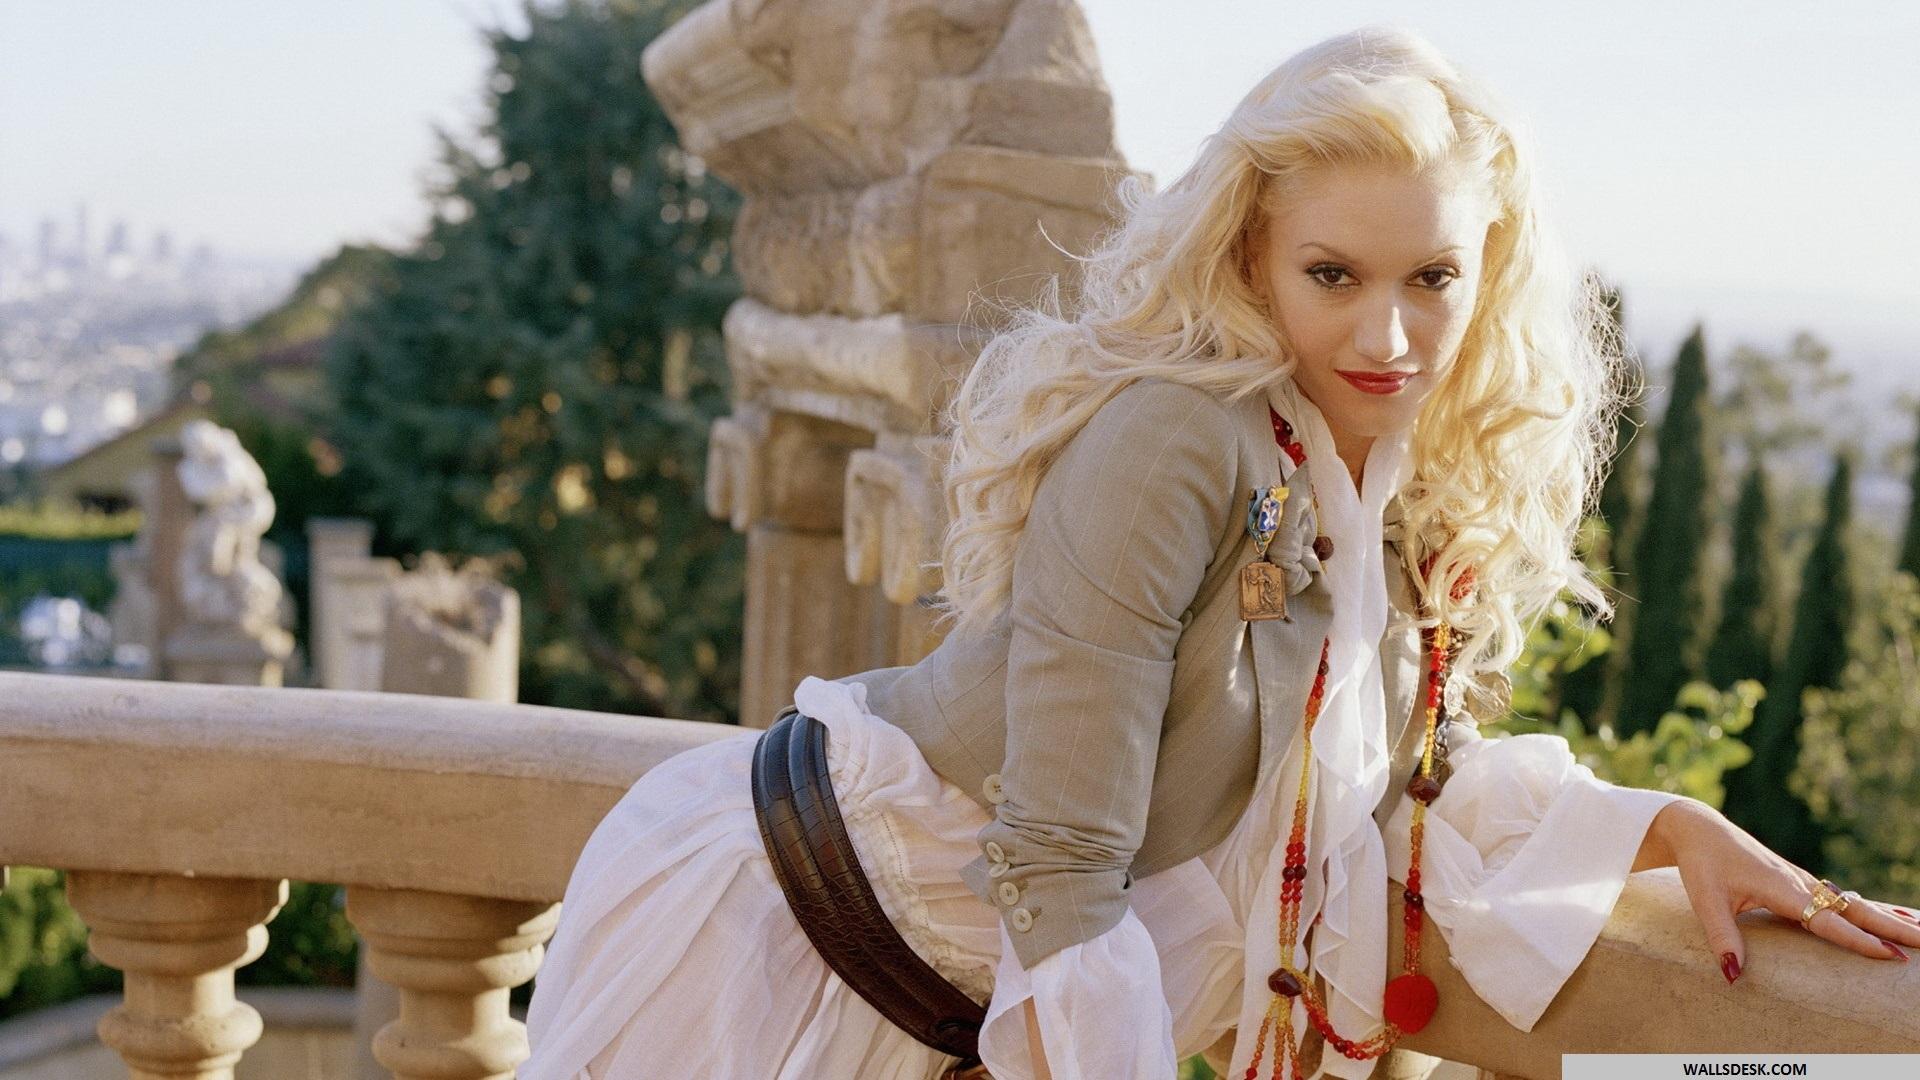 Gwen Stefani Full Hd